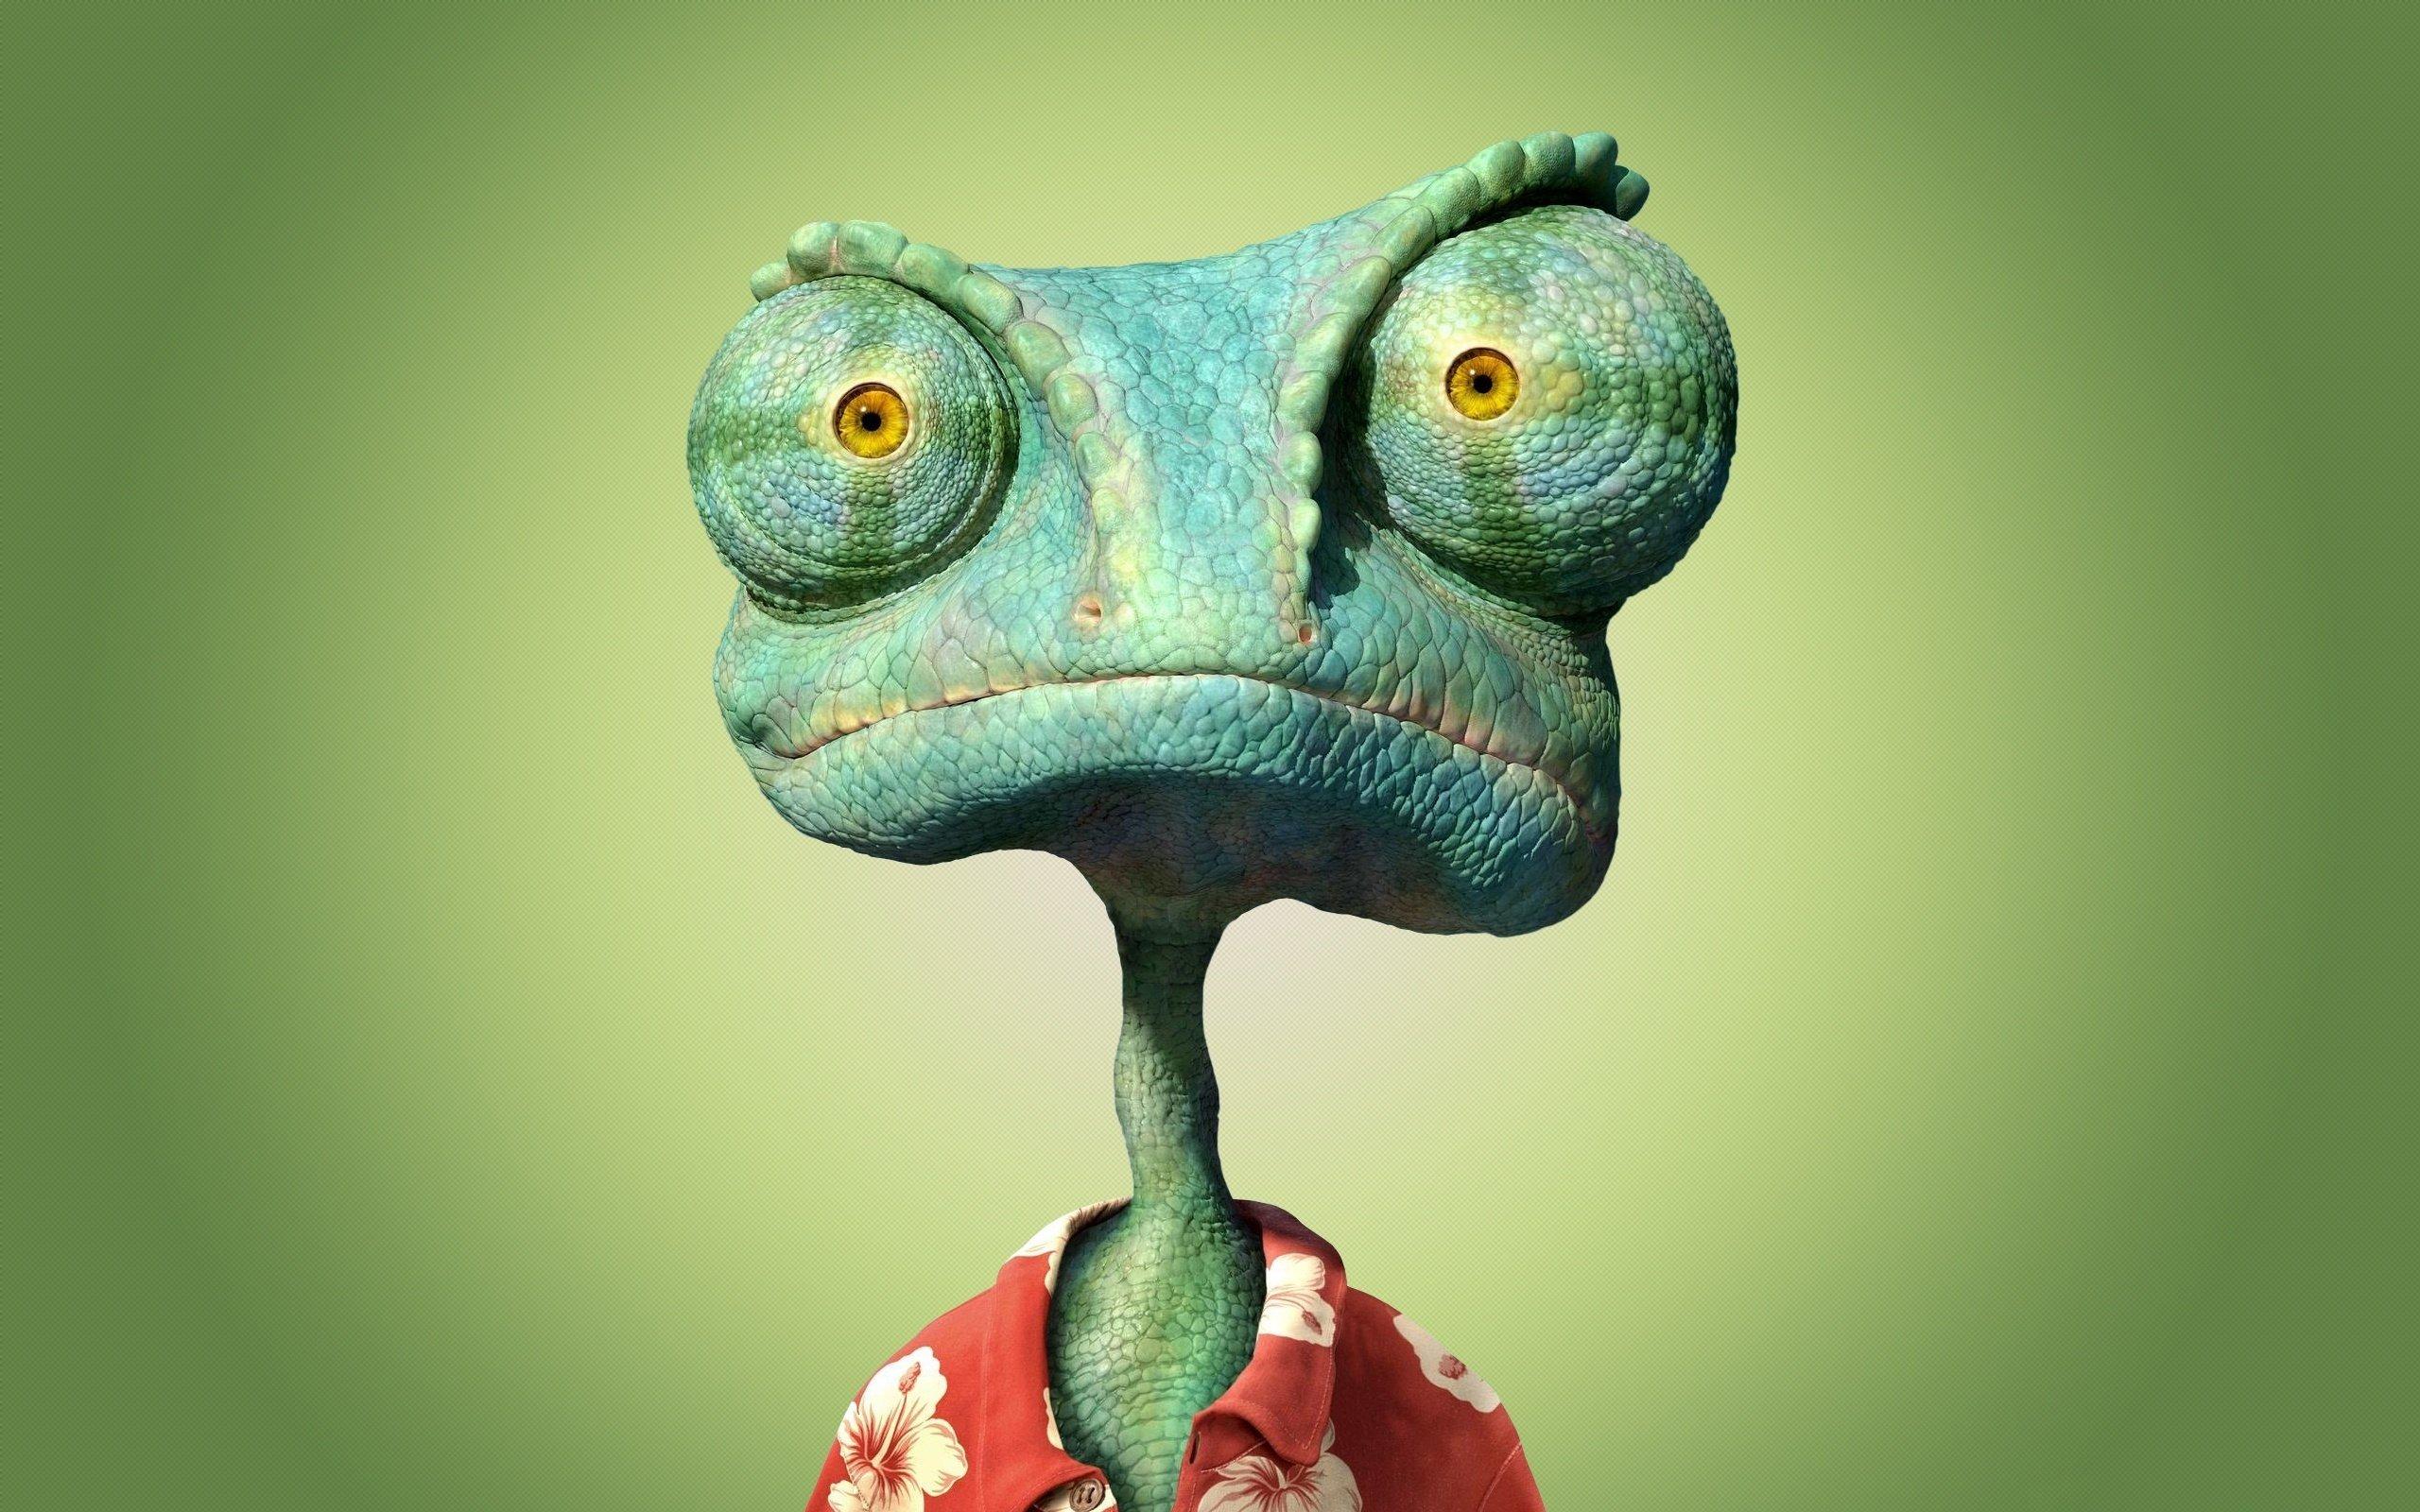 Lizard HD wallpaper